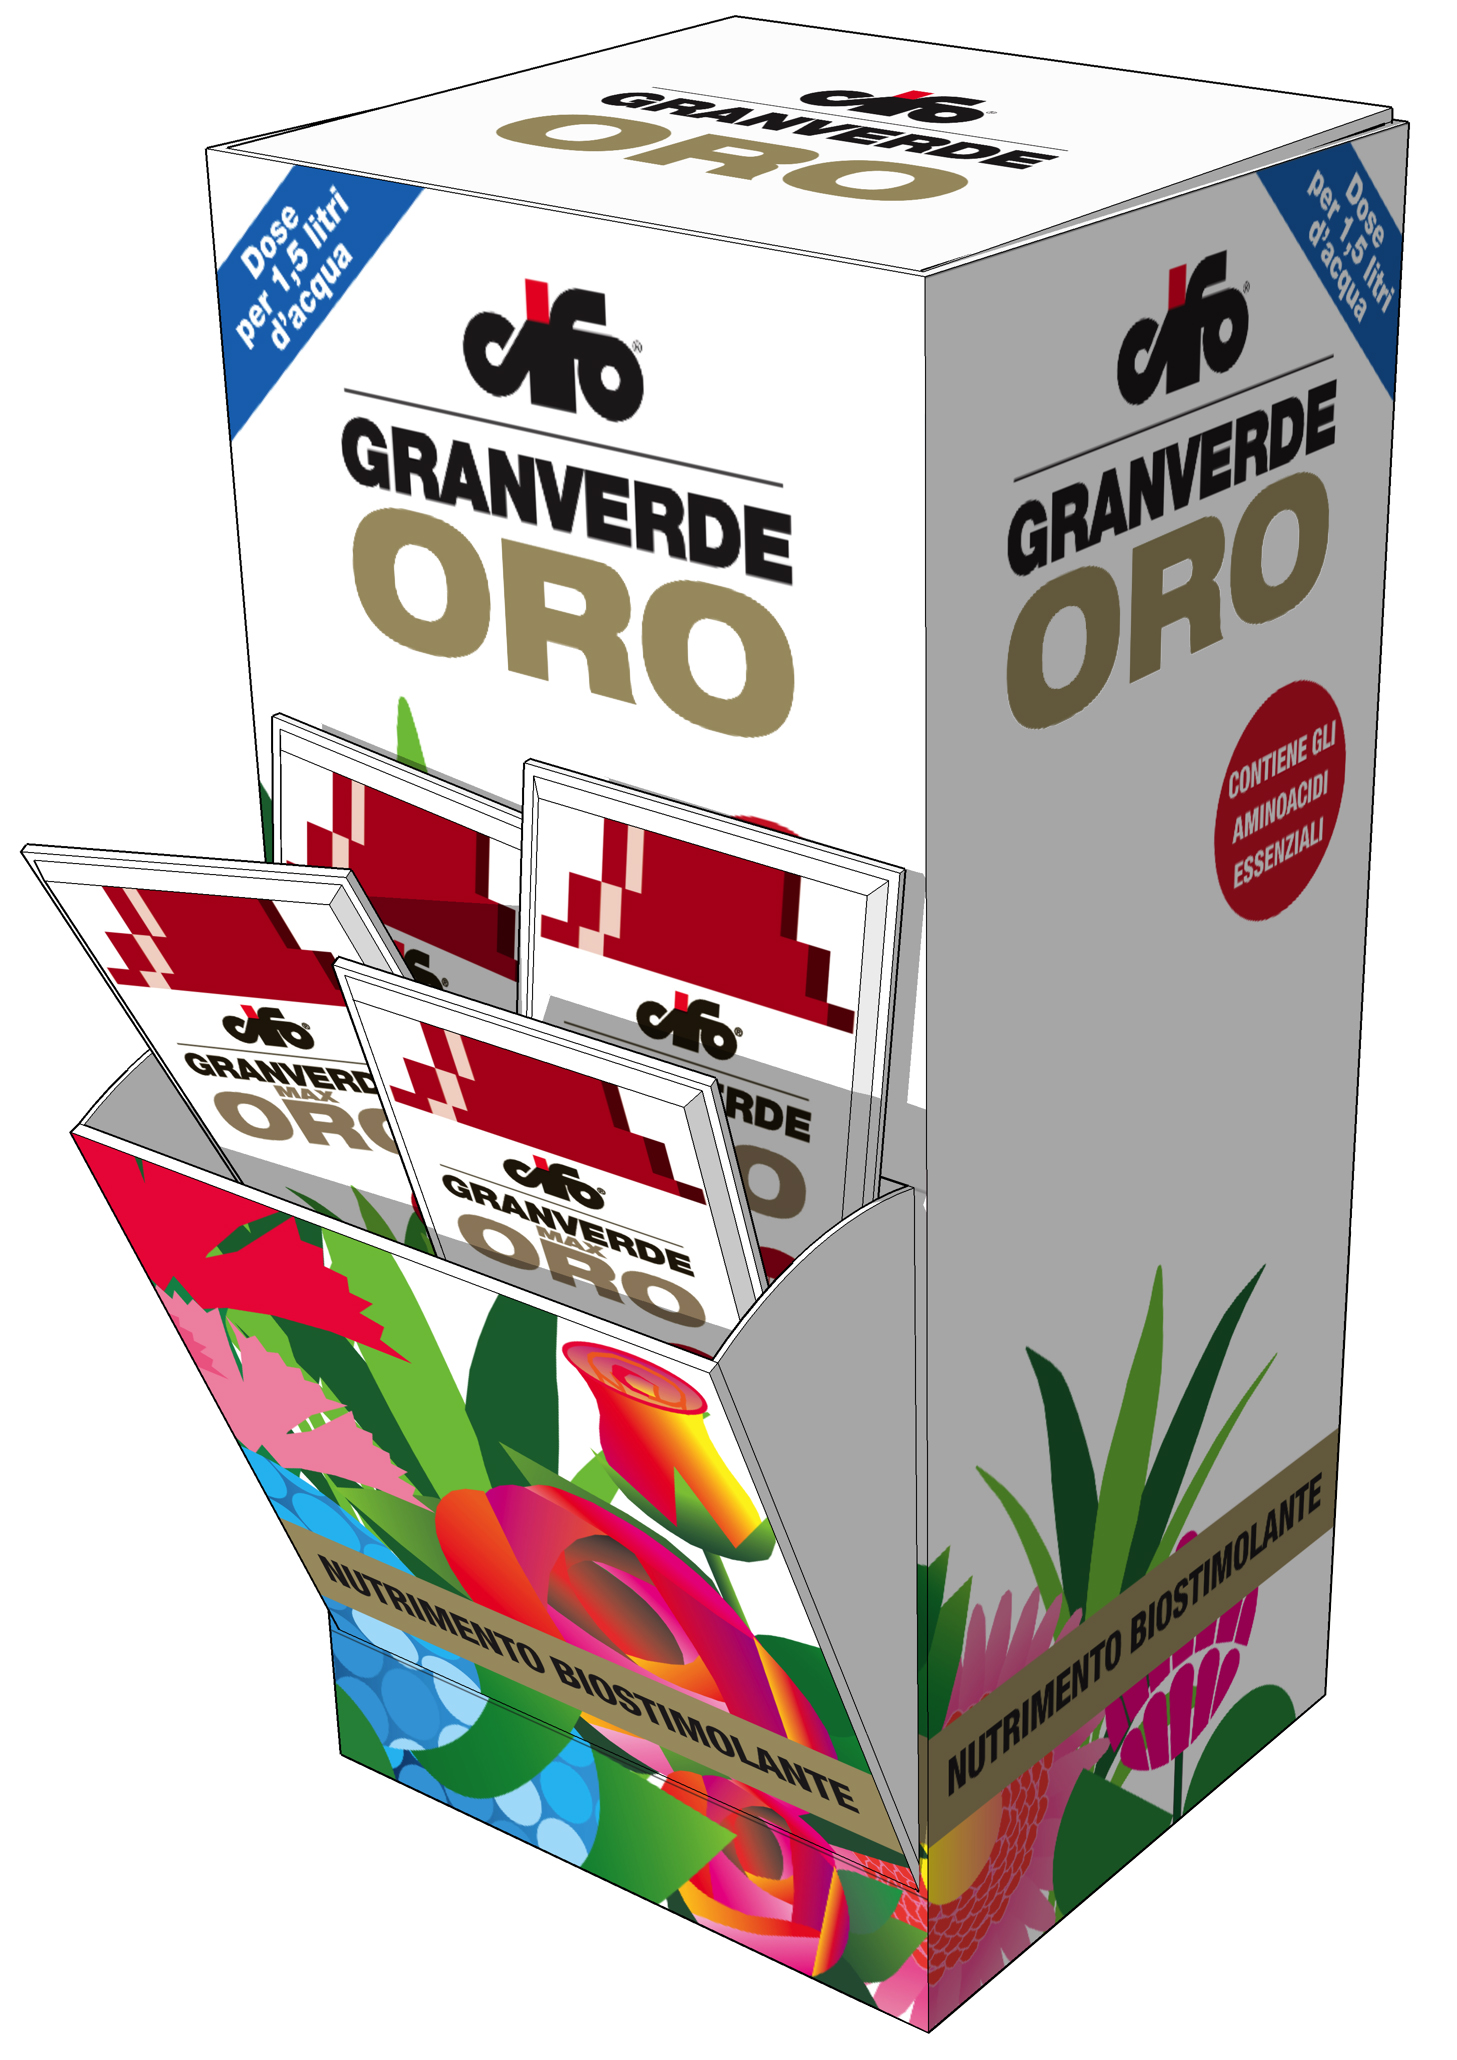 CIFO SPA - GRANVERDE ORCHIDEE